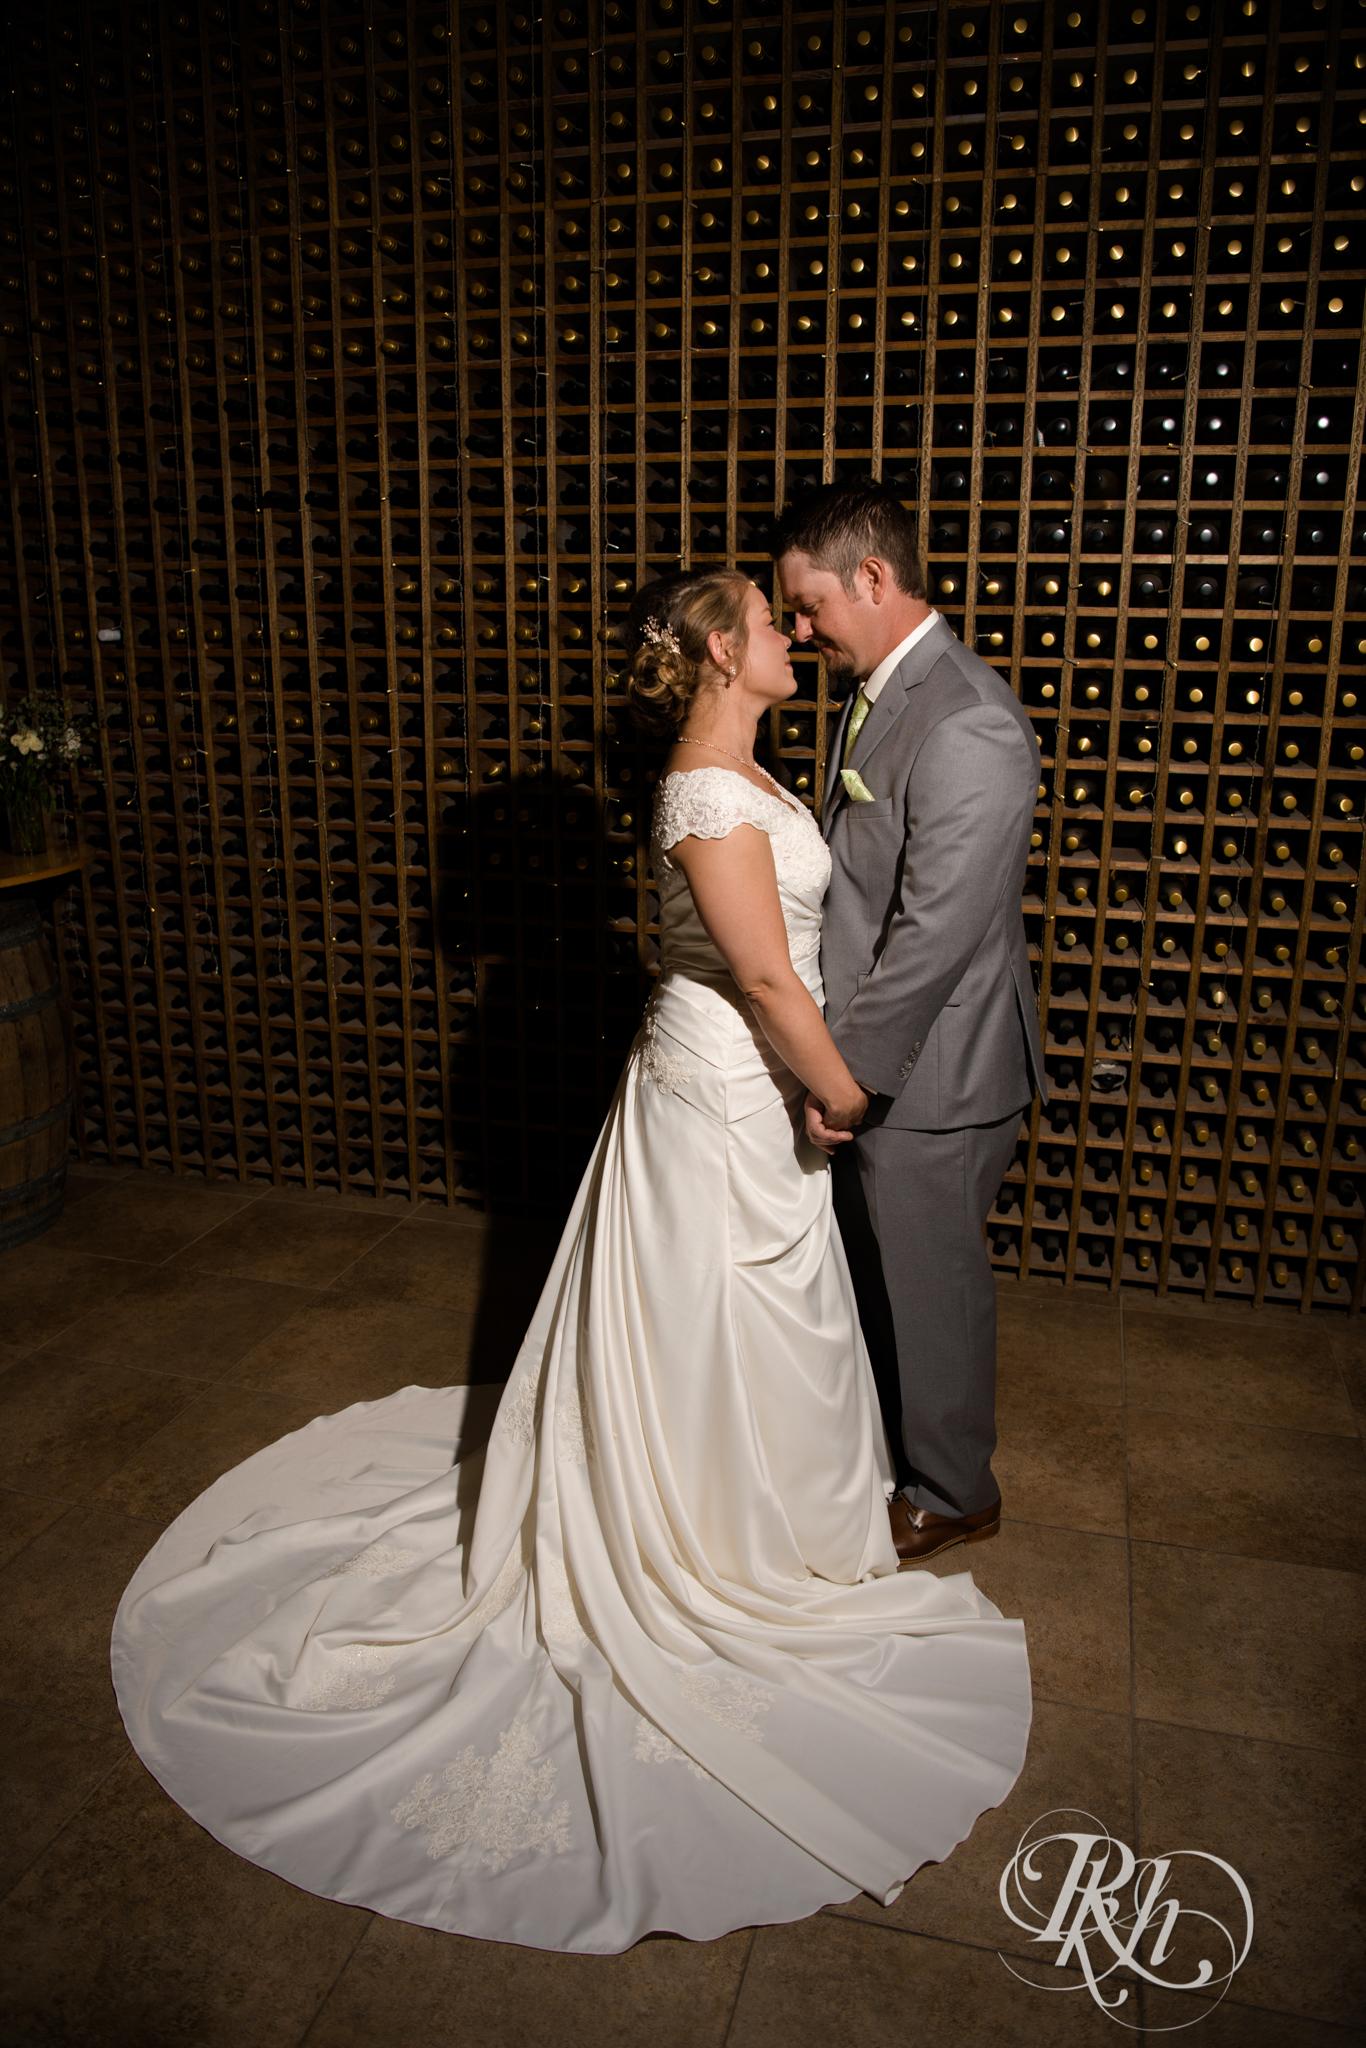 Ally & Nick - Minnesota Wedding Photography - Next Chapter Winery - RKH Images - Blog (32 of 57).jpg